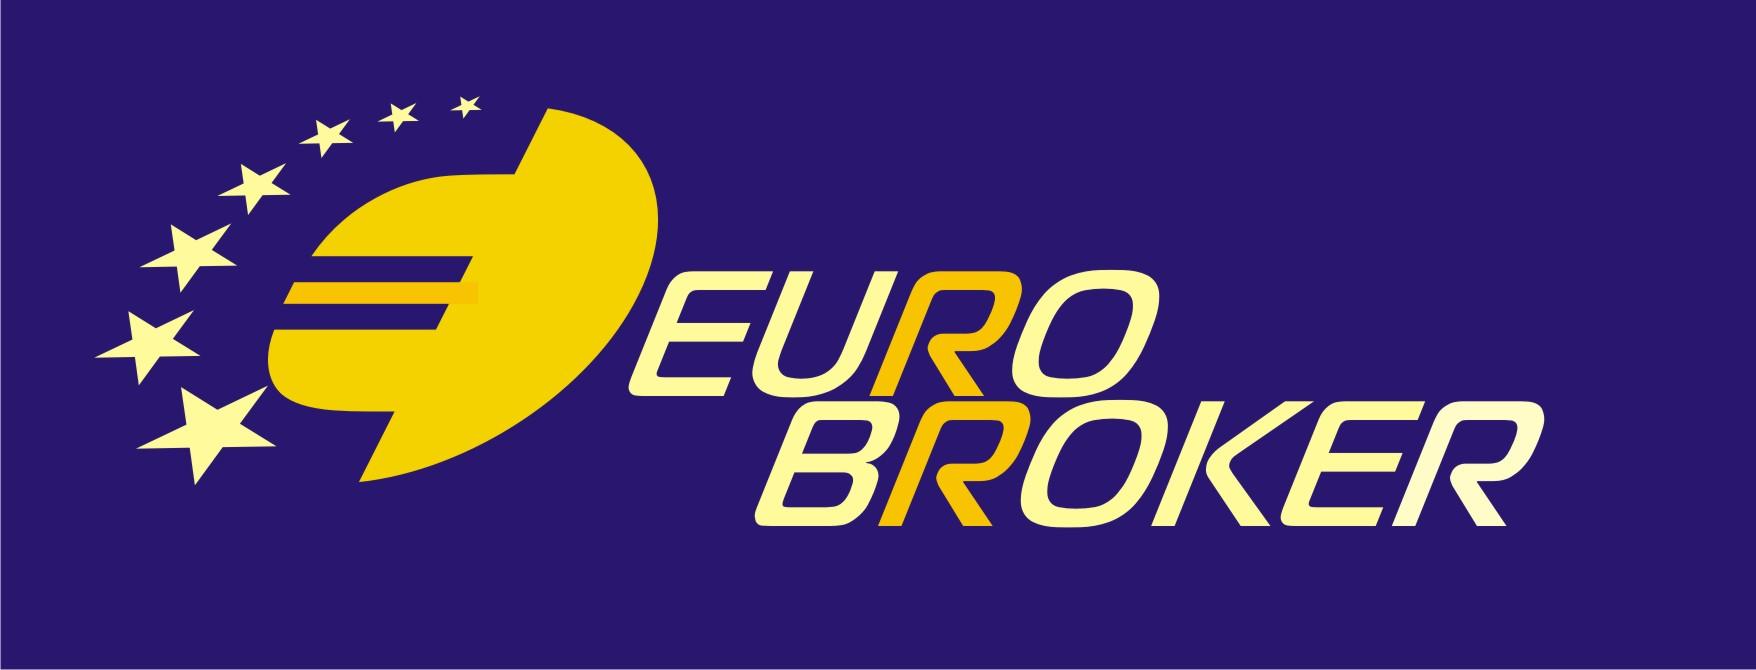 Разработка логотипа компании для сайта фото f_4bec42360540a.jpg